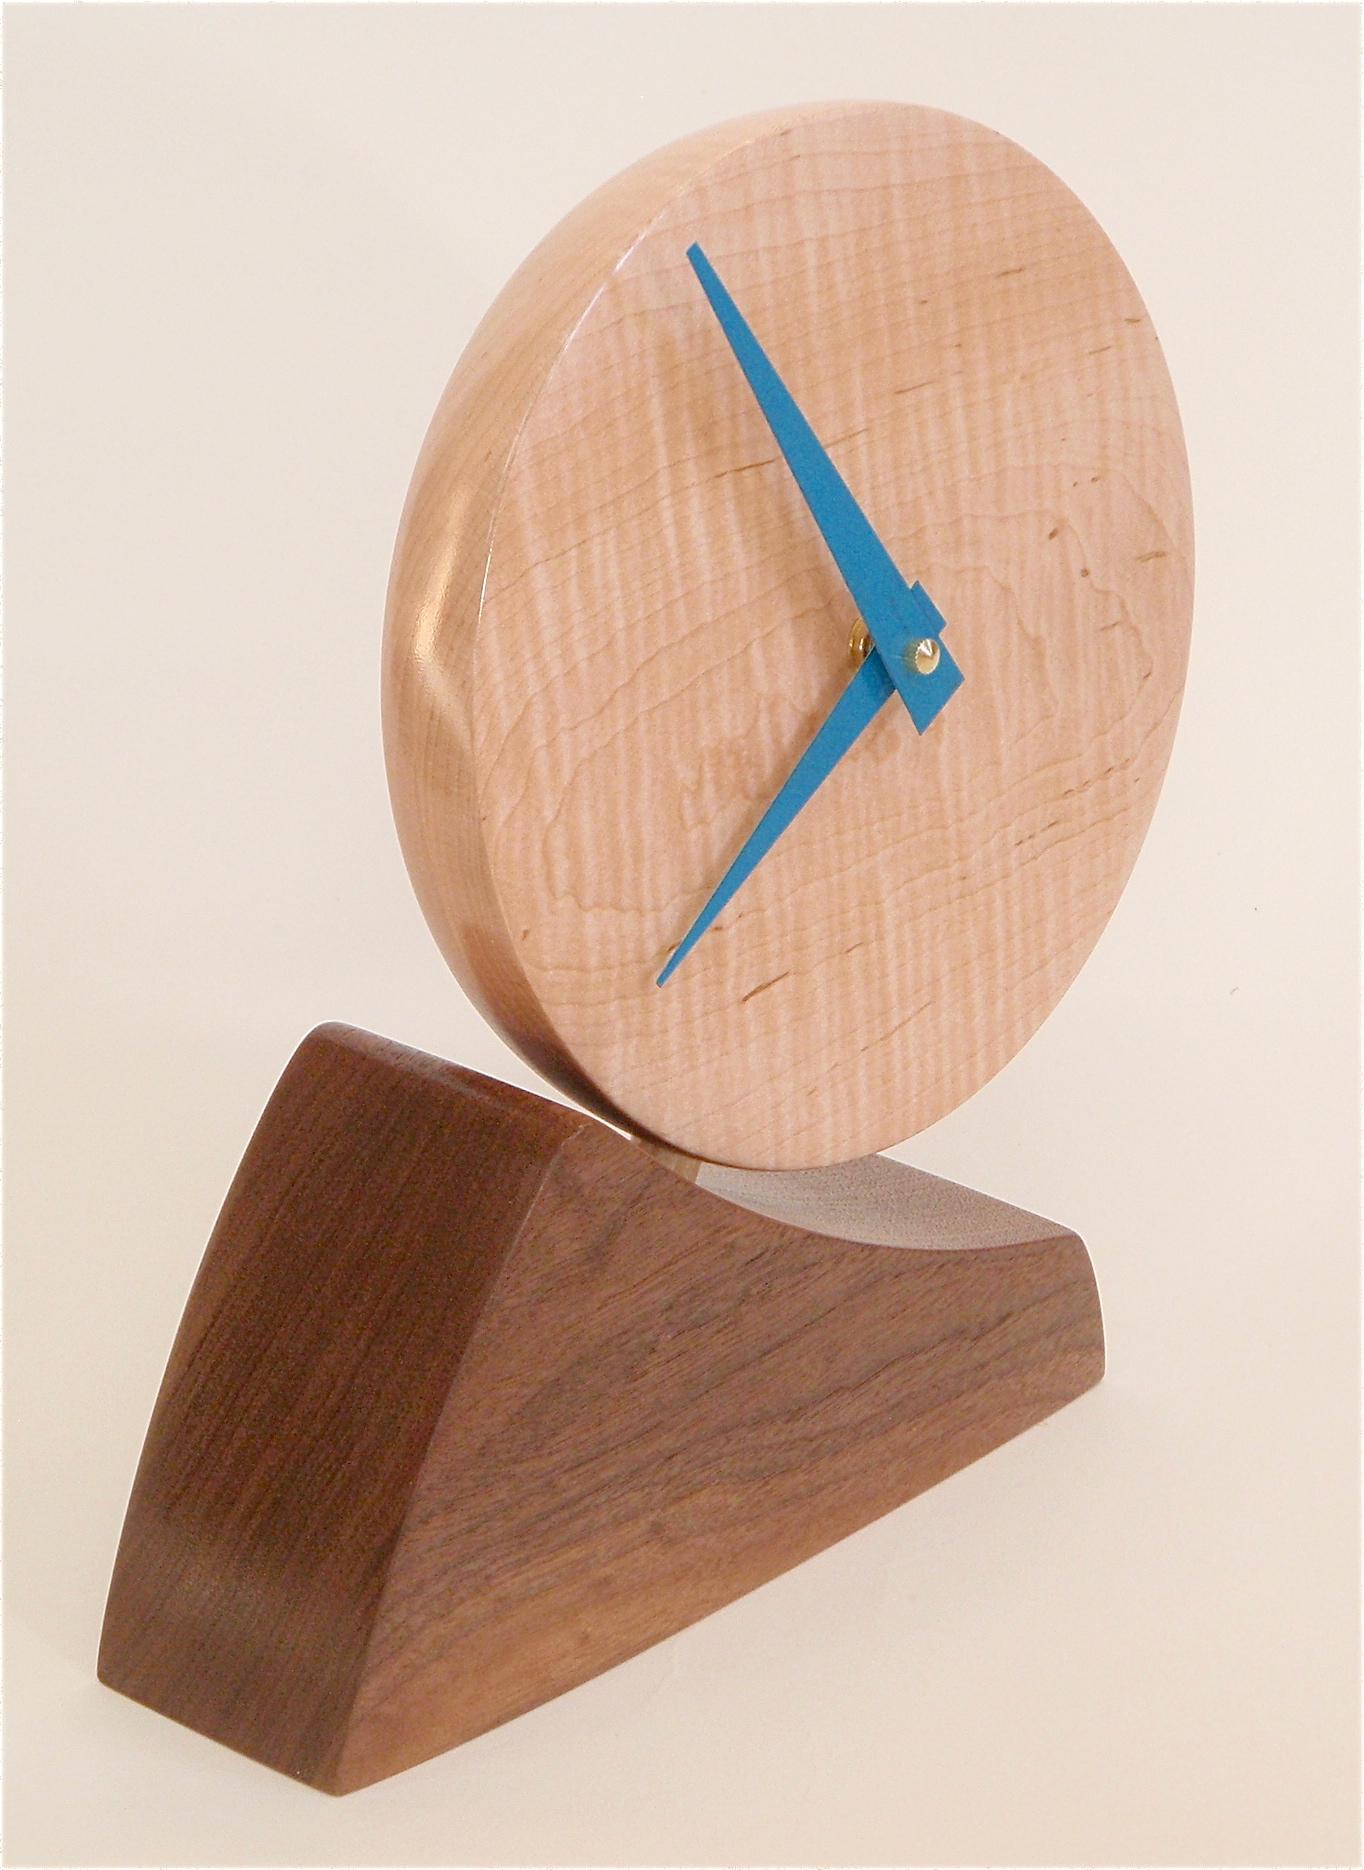 Adjustable desk clock 04